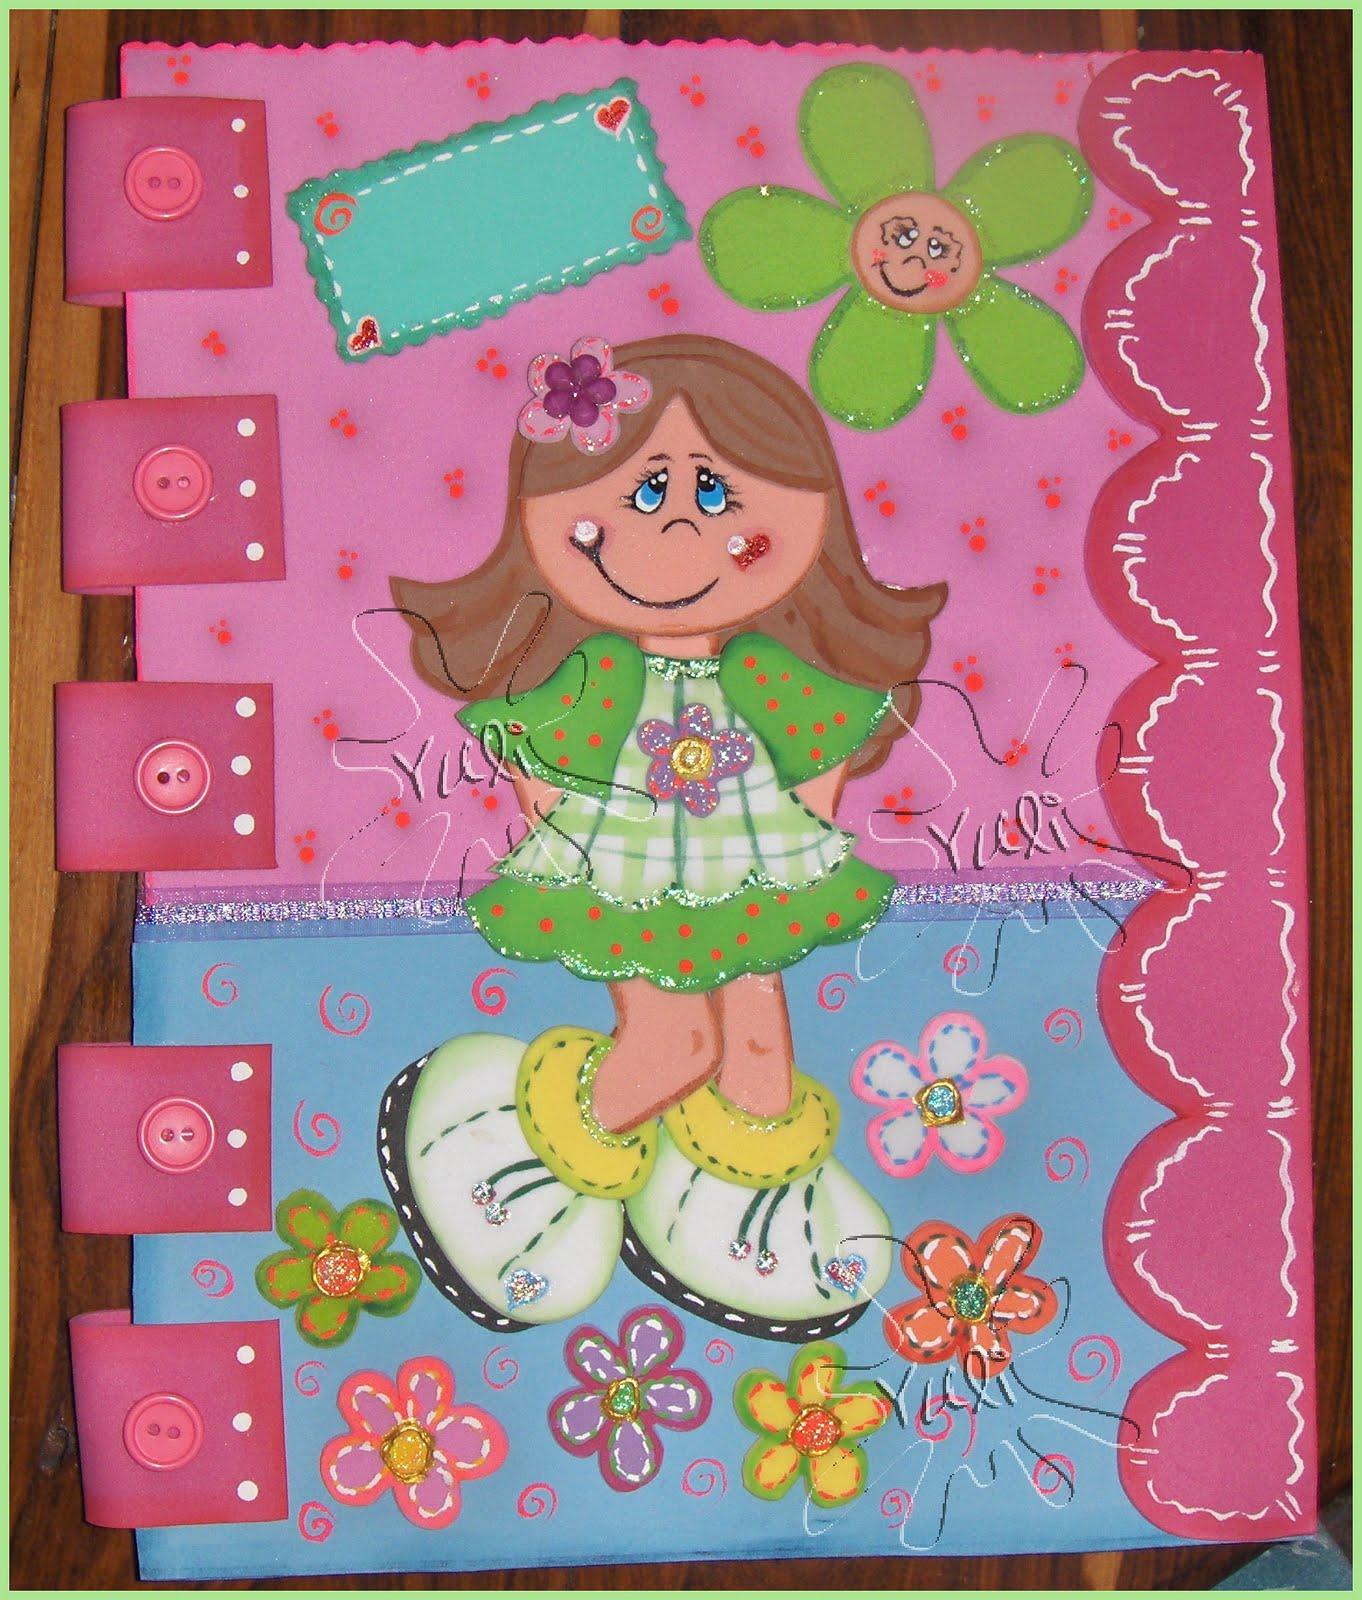 Manualidades de carpetas en foami - Imagui